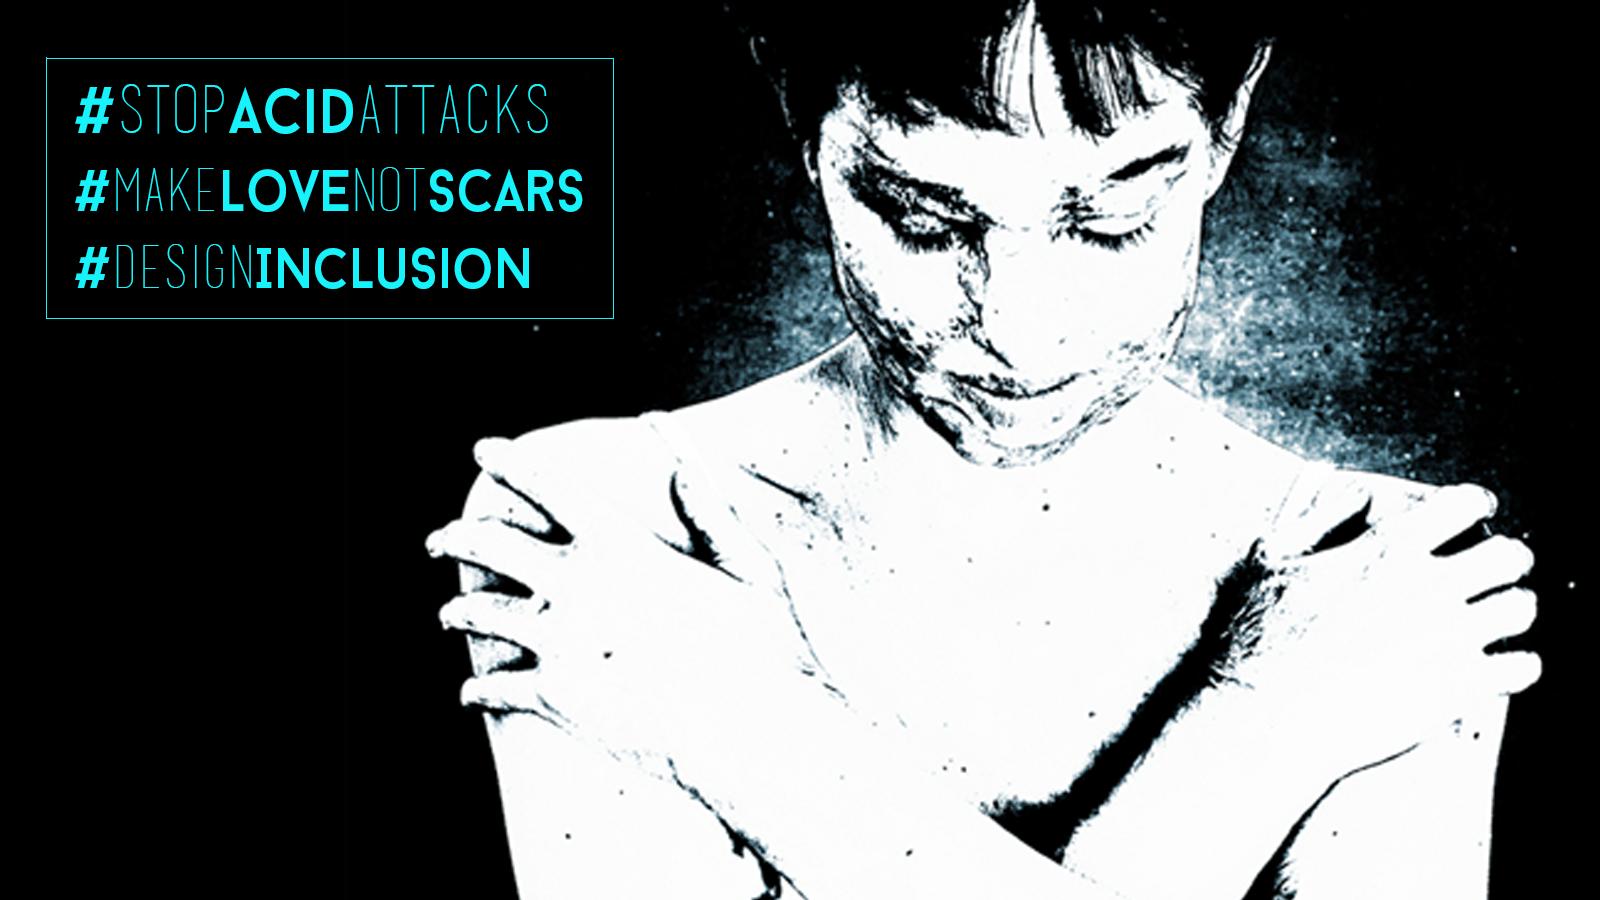 Acid Attack victim Natalia Ponce de León www.fundacionnataliaponcedeleon.org